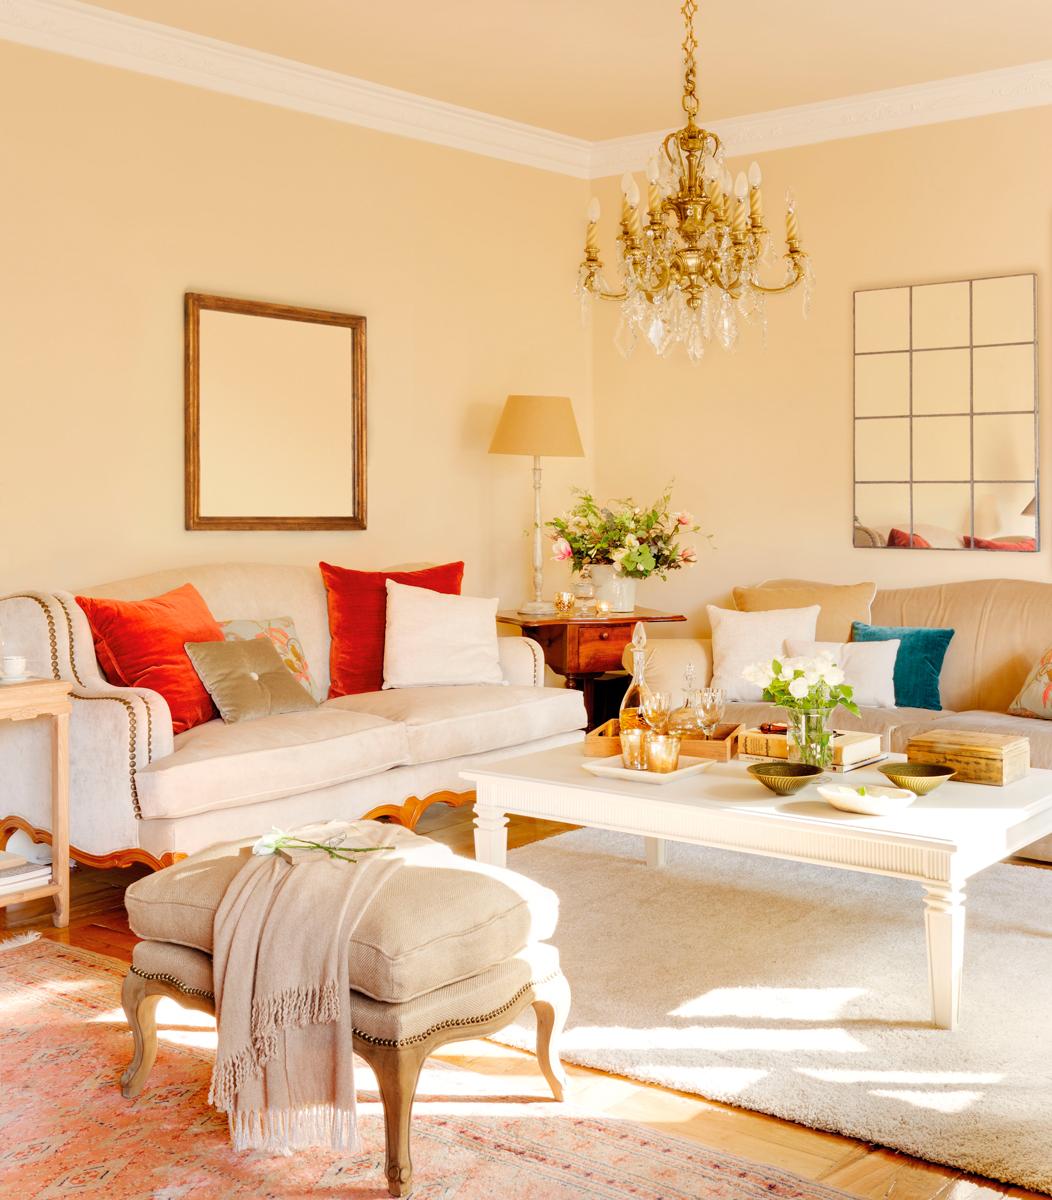 Cojines para sofa rojo stunning excellent size x como - Sofa de cojines ...